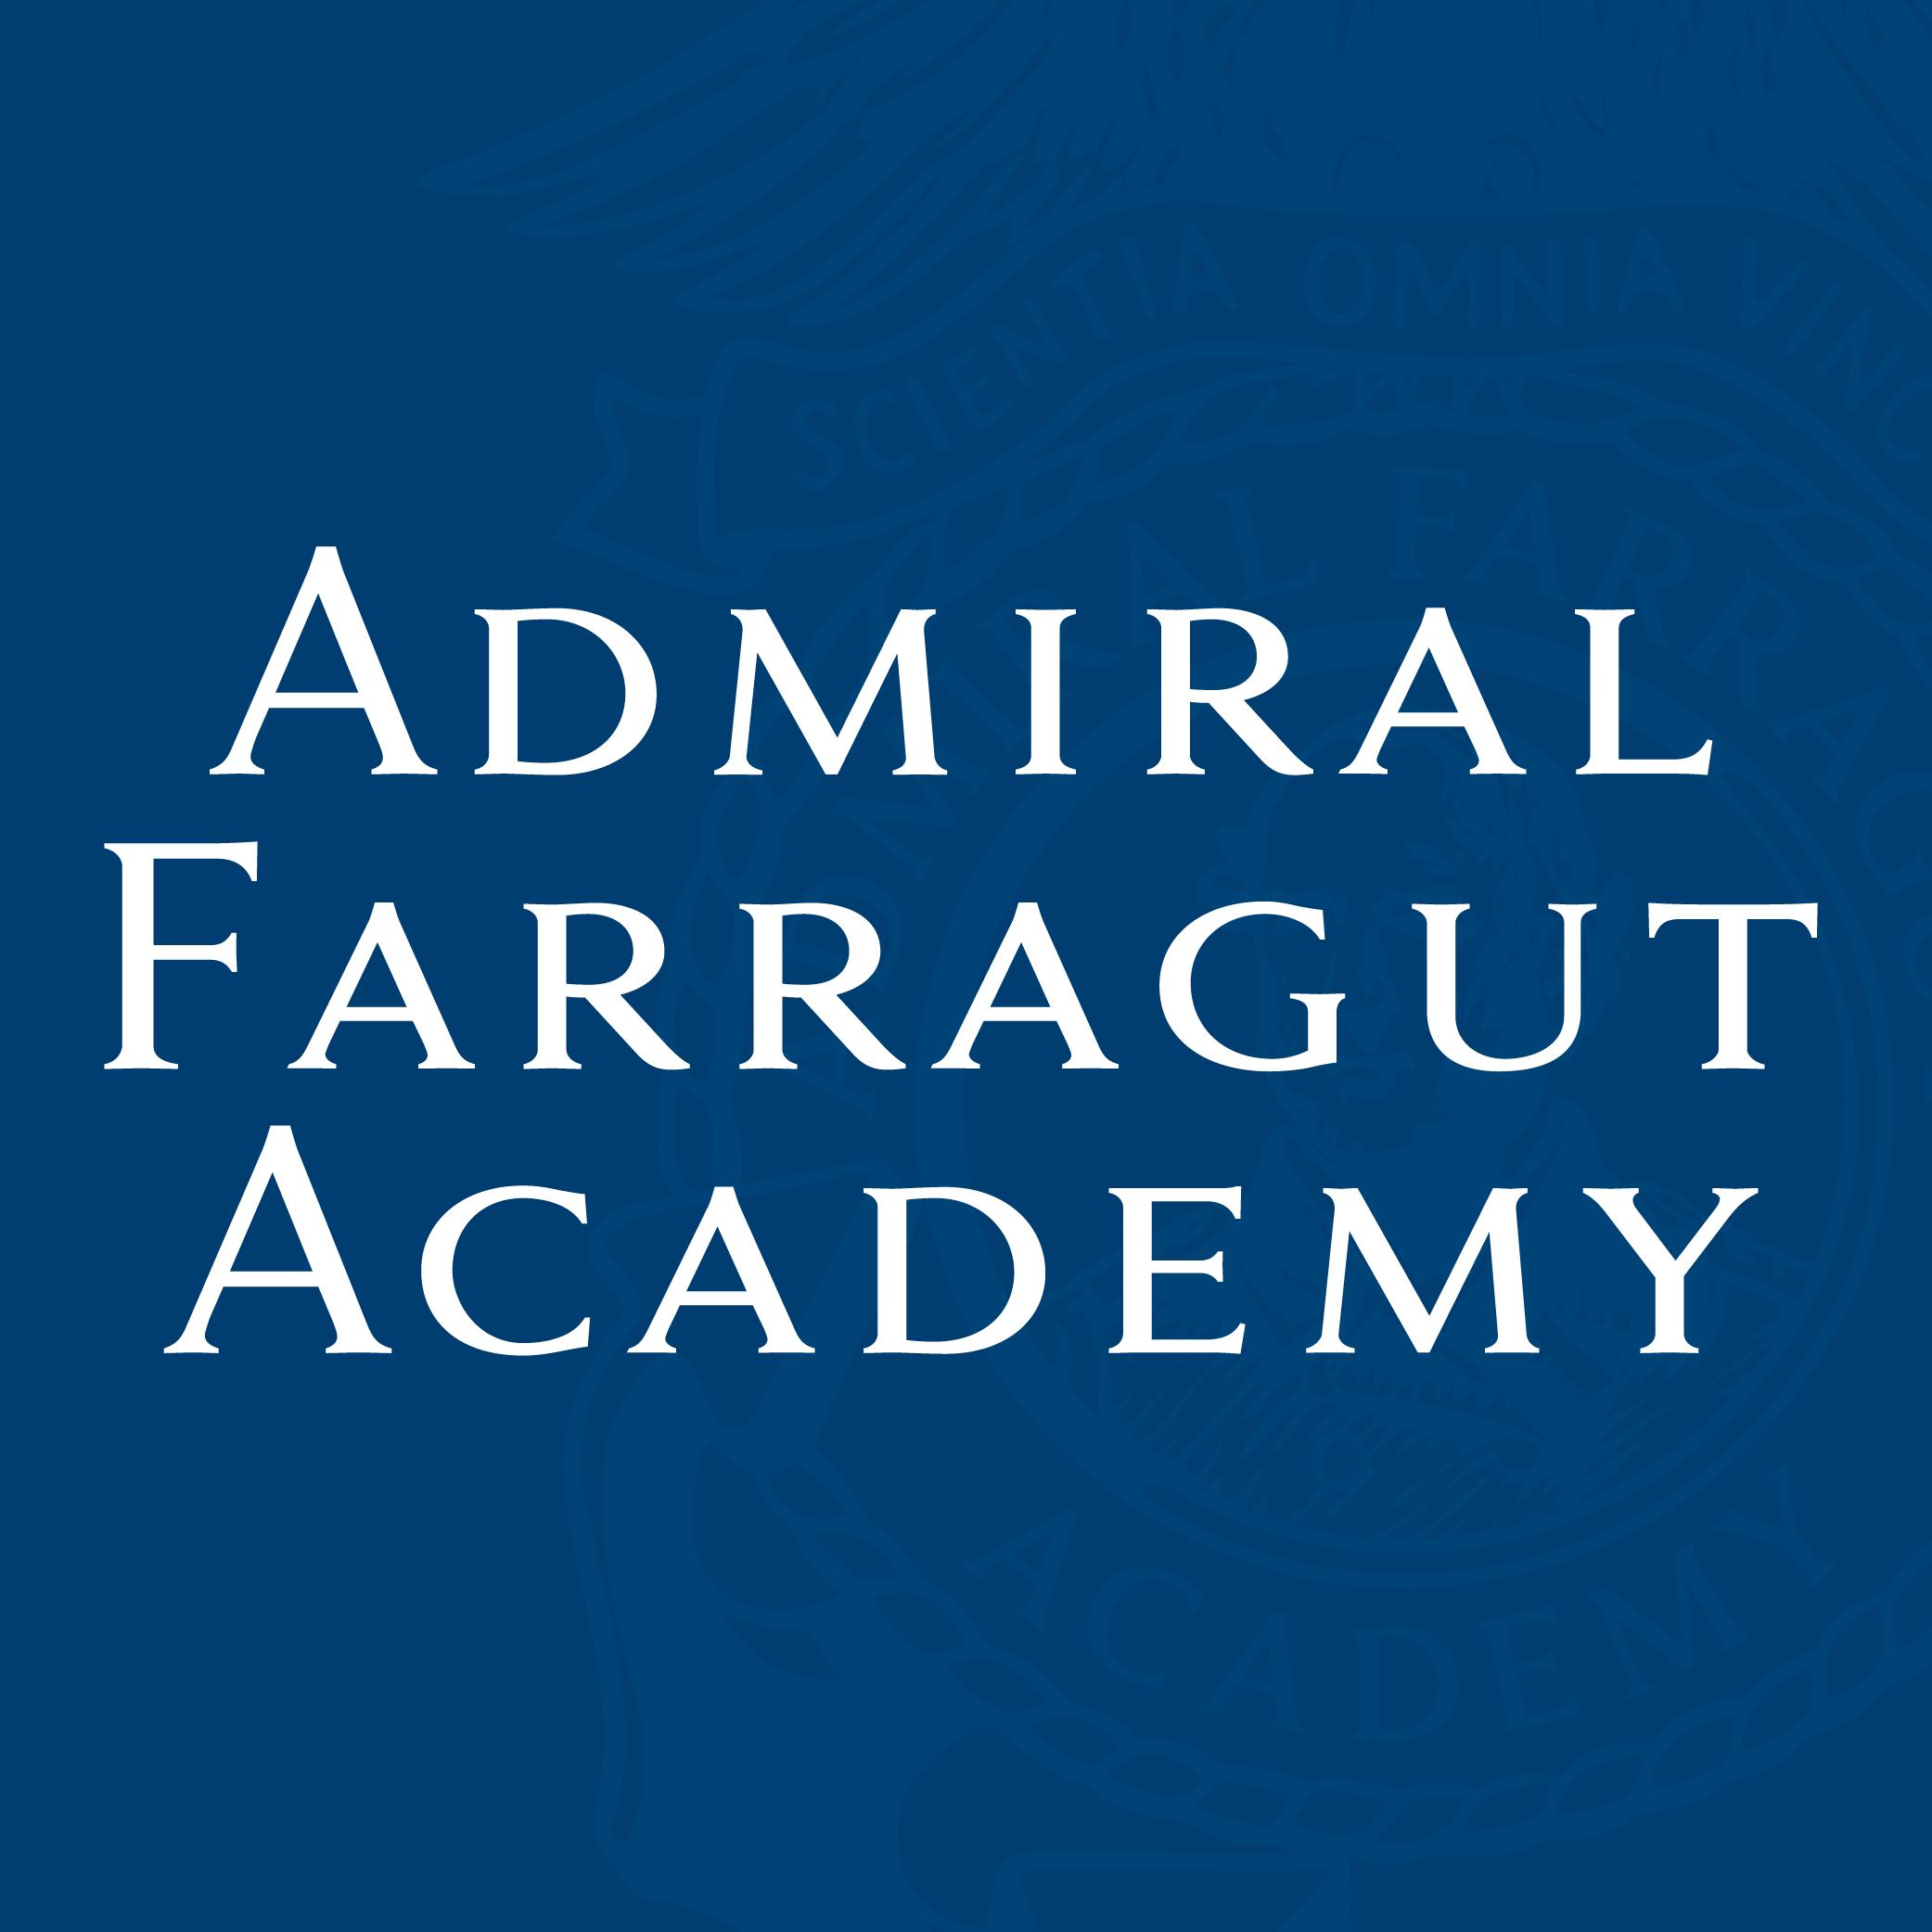 Admiral Farragut Academy | Boarding School in Florida with Signature Programs